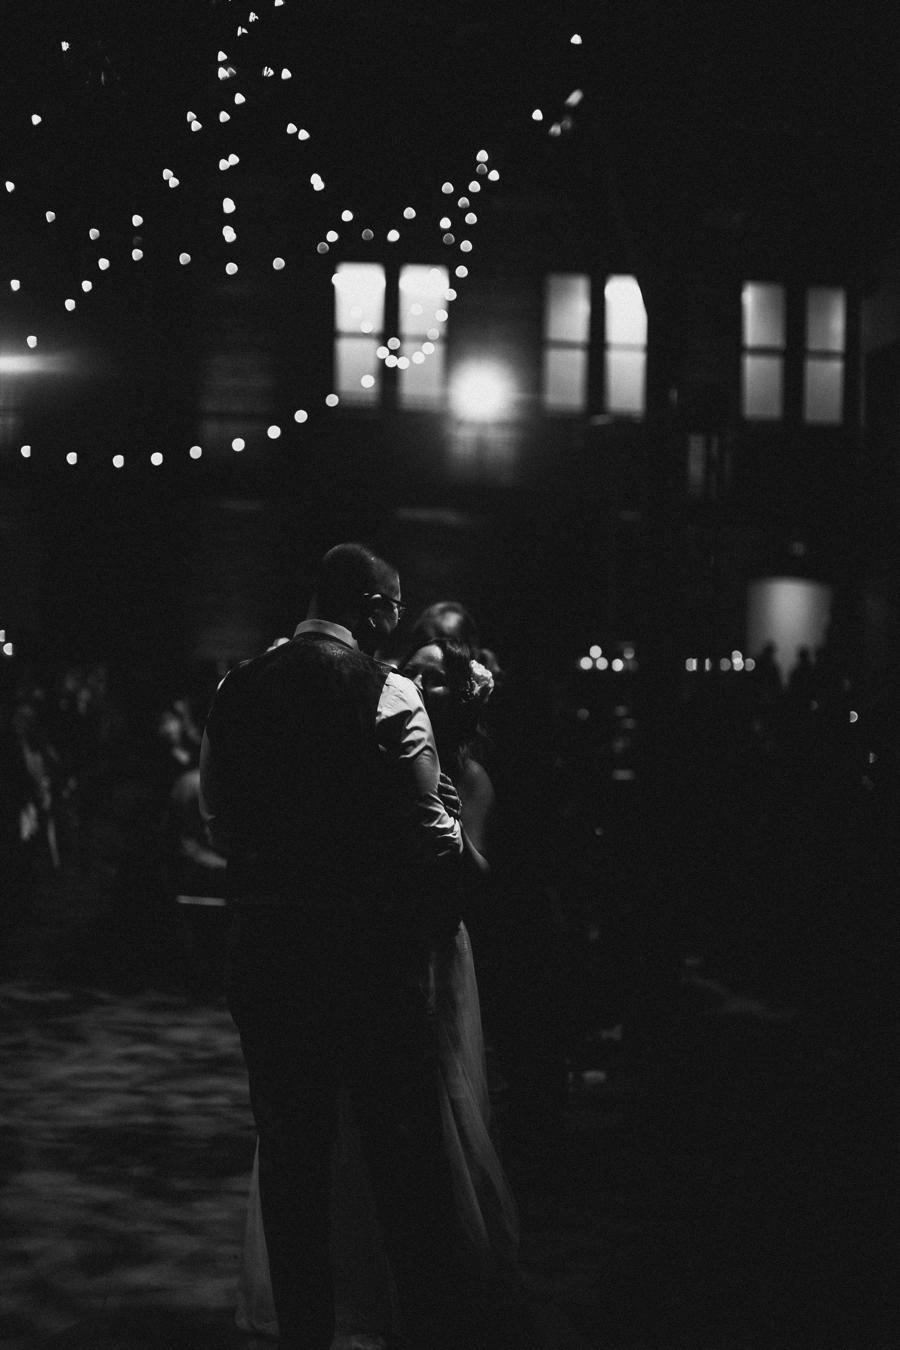 440_Seaton_Los_Angeles_Wedding_Abi_Q_Photography_-228.jpg